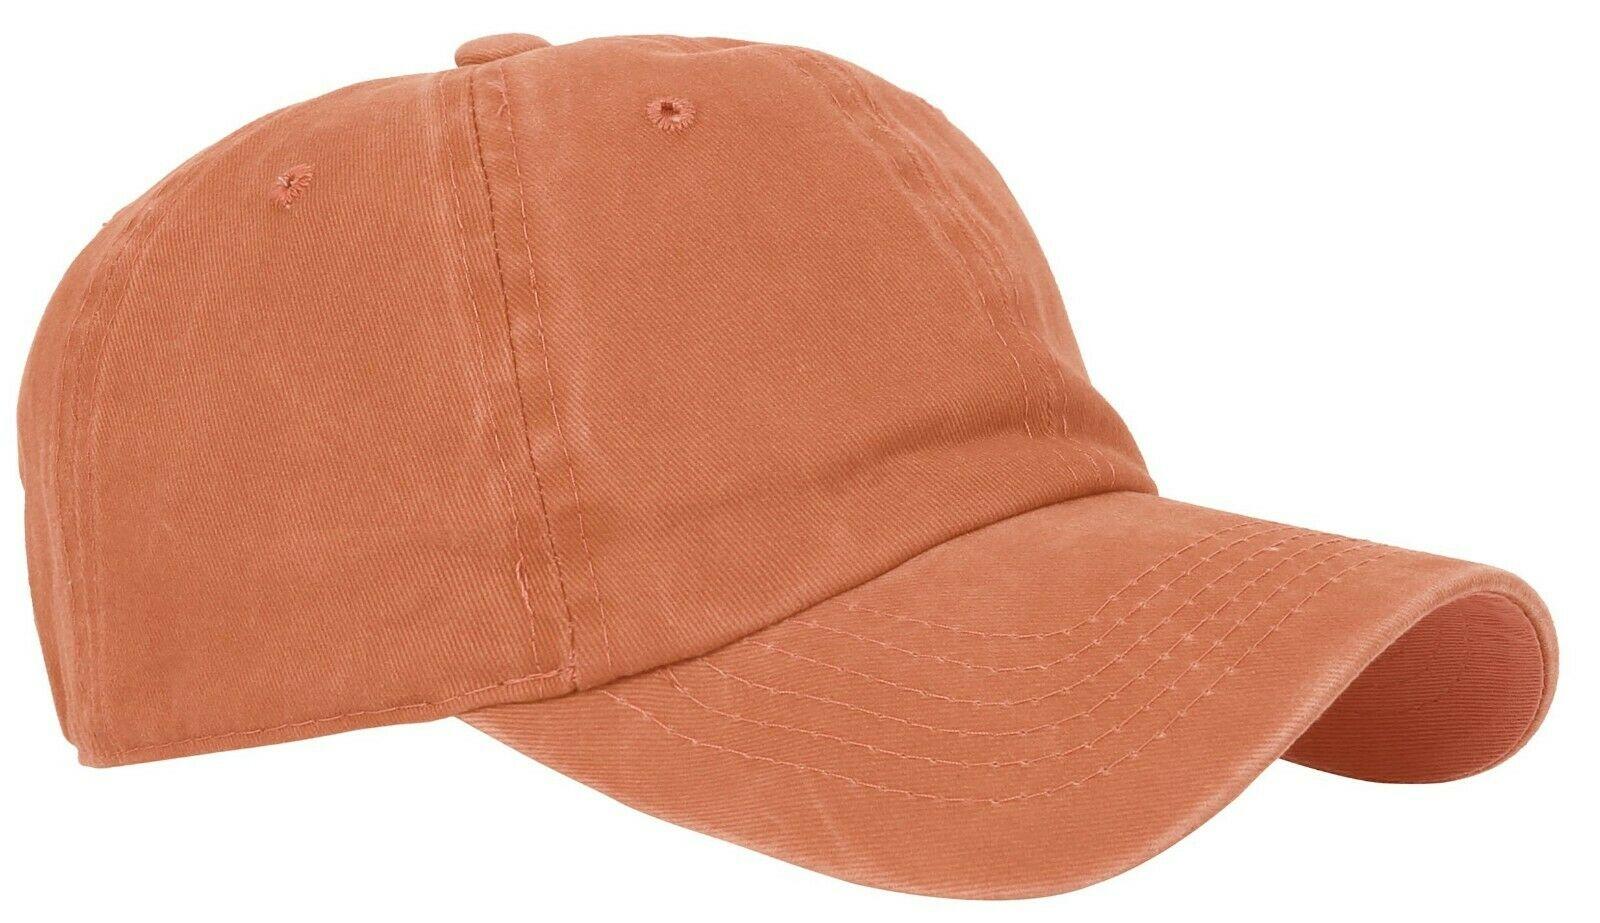 BASEBALL-CAP-Plain-Dad-Hat-Low-Profile-Vintage-Washed-Pigment-Adjustable thumbnail 11